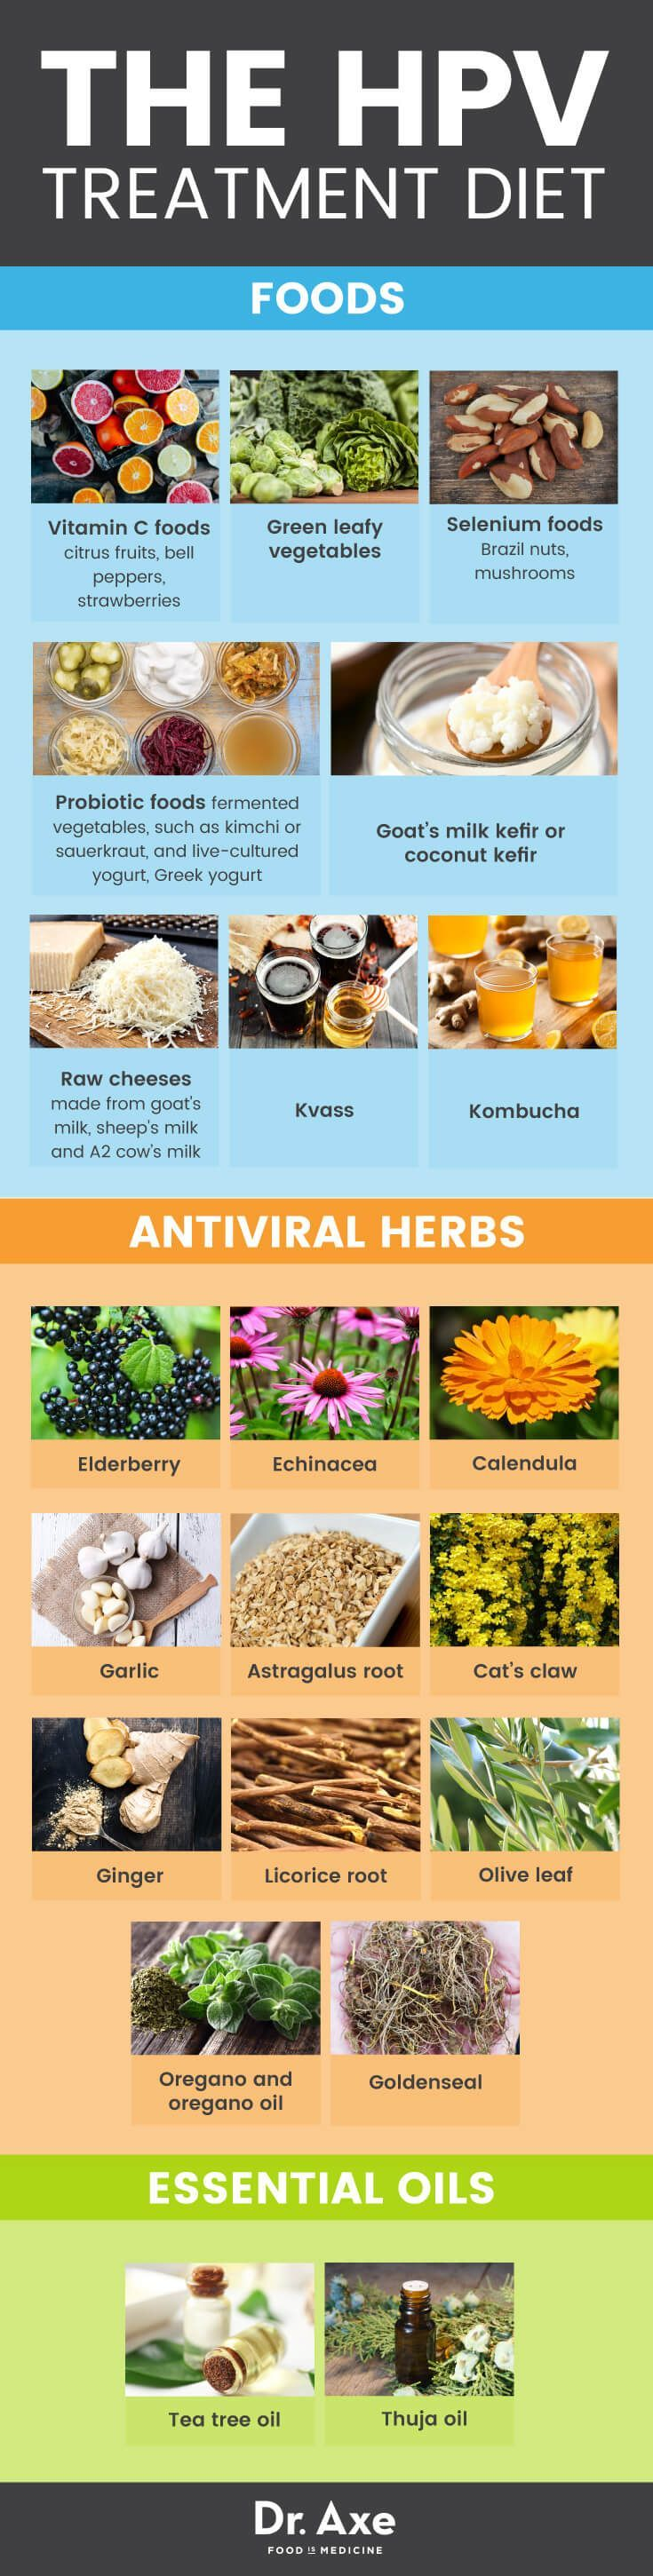 hpv natural medicine